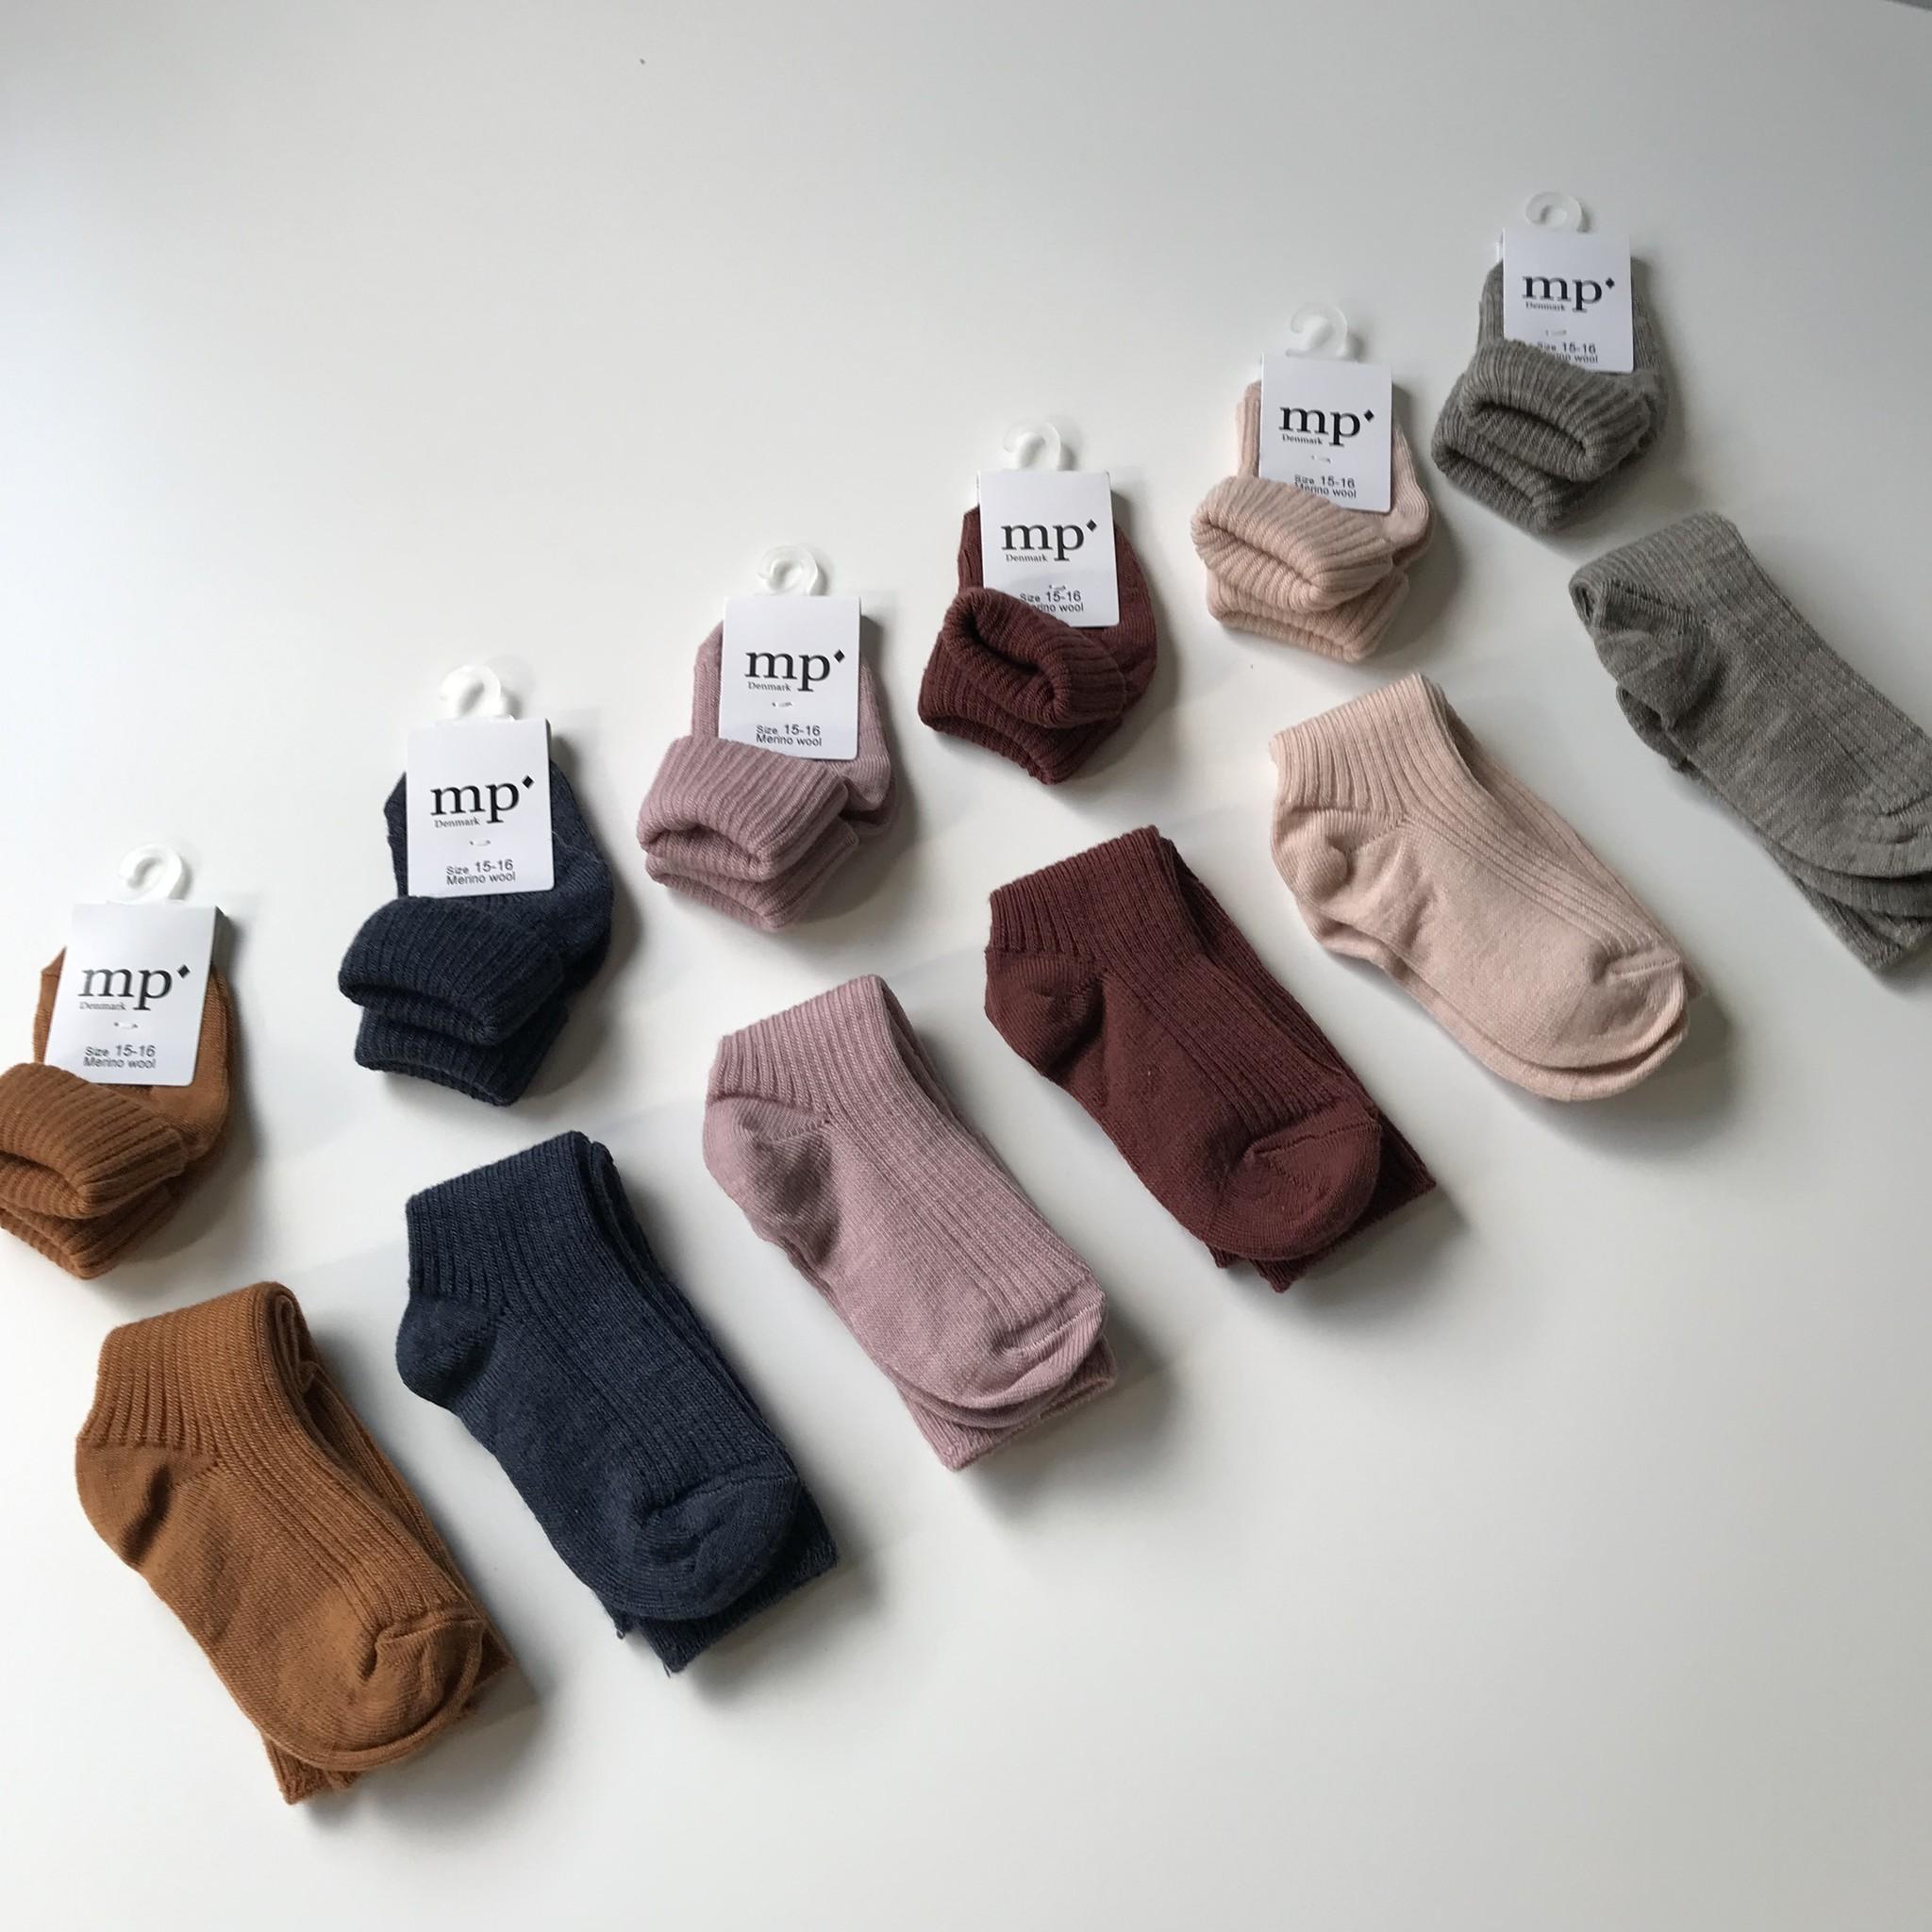 MP Denmark wollen kniekousjes - 80% merino wool - bruin rood - maat 15 tm 32